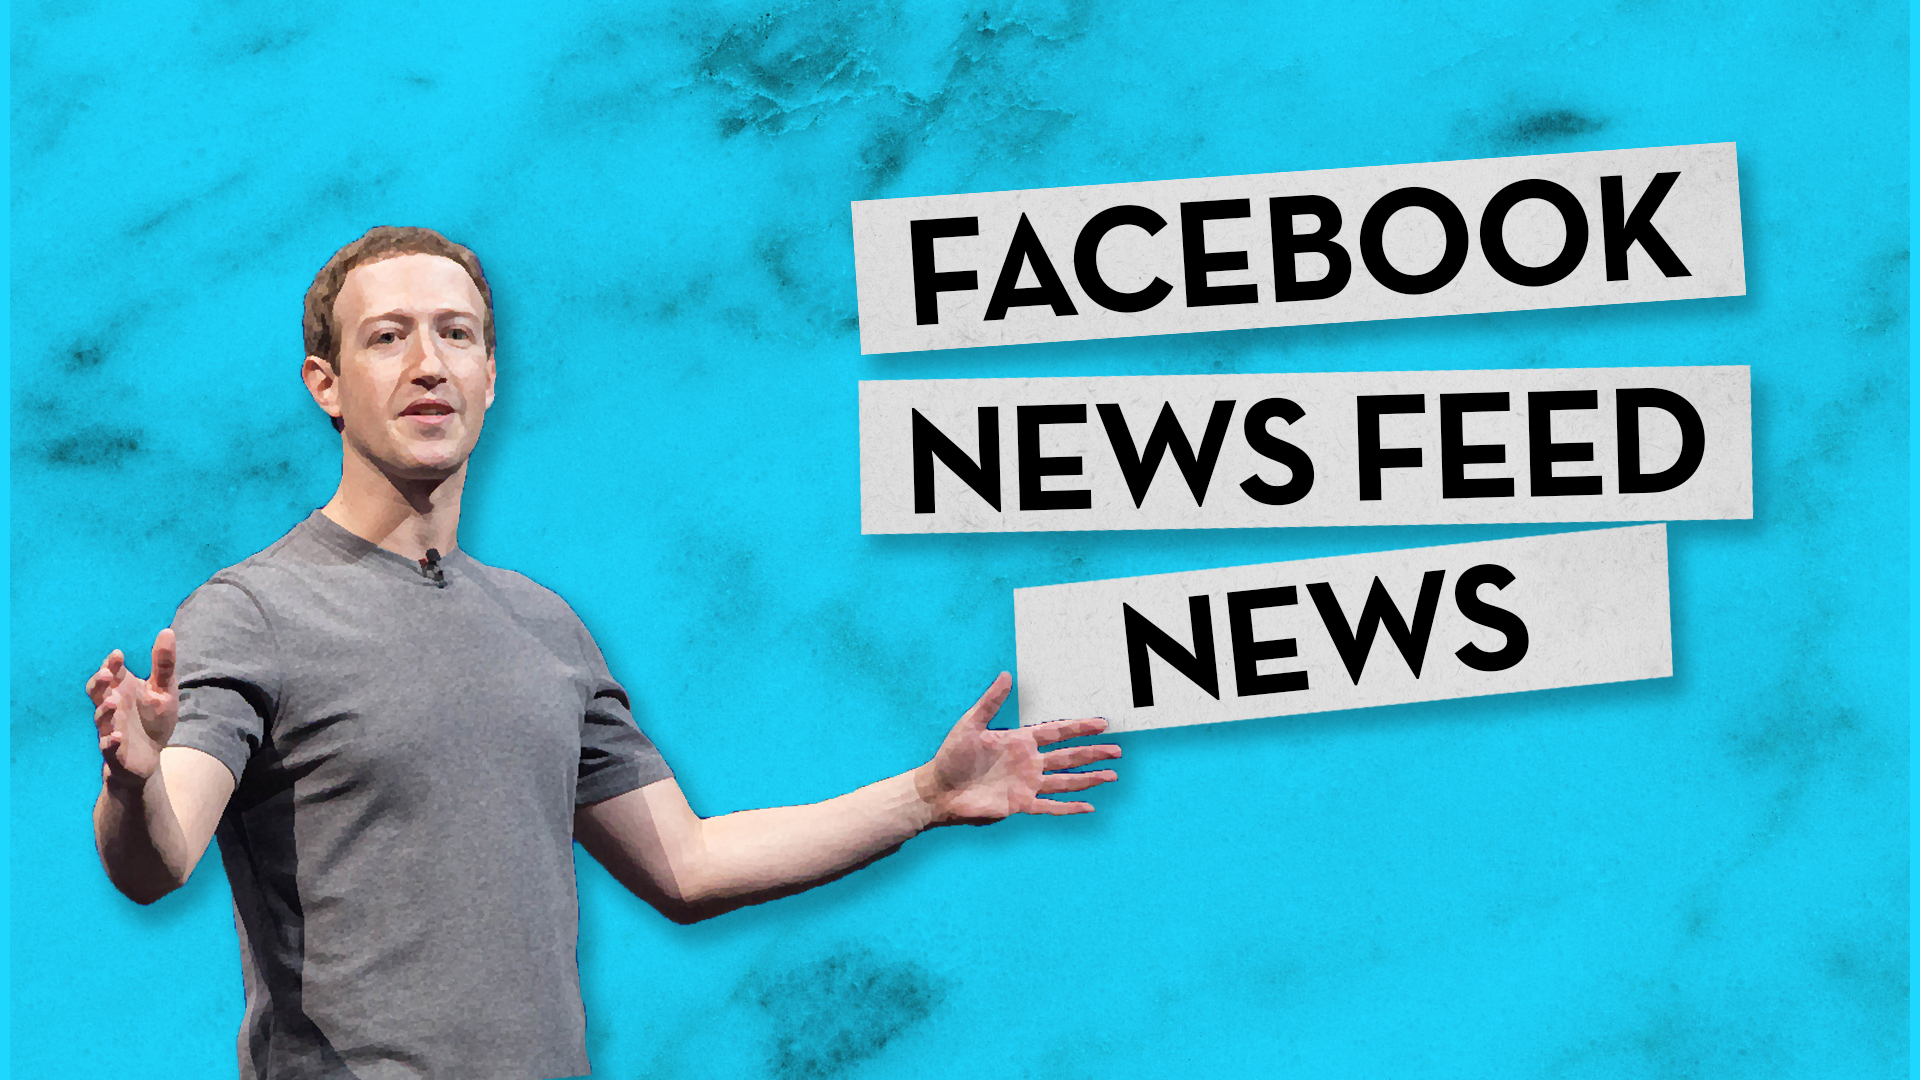 FB News Feed Blog Thumb.jpg